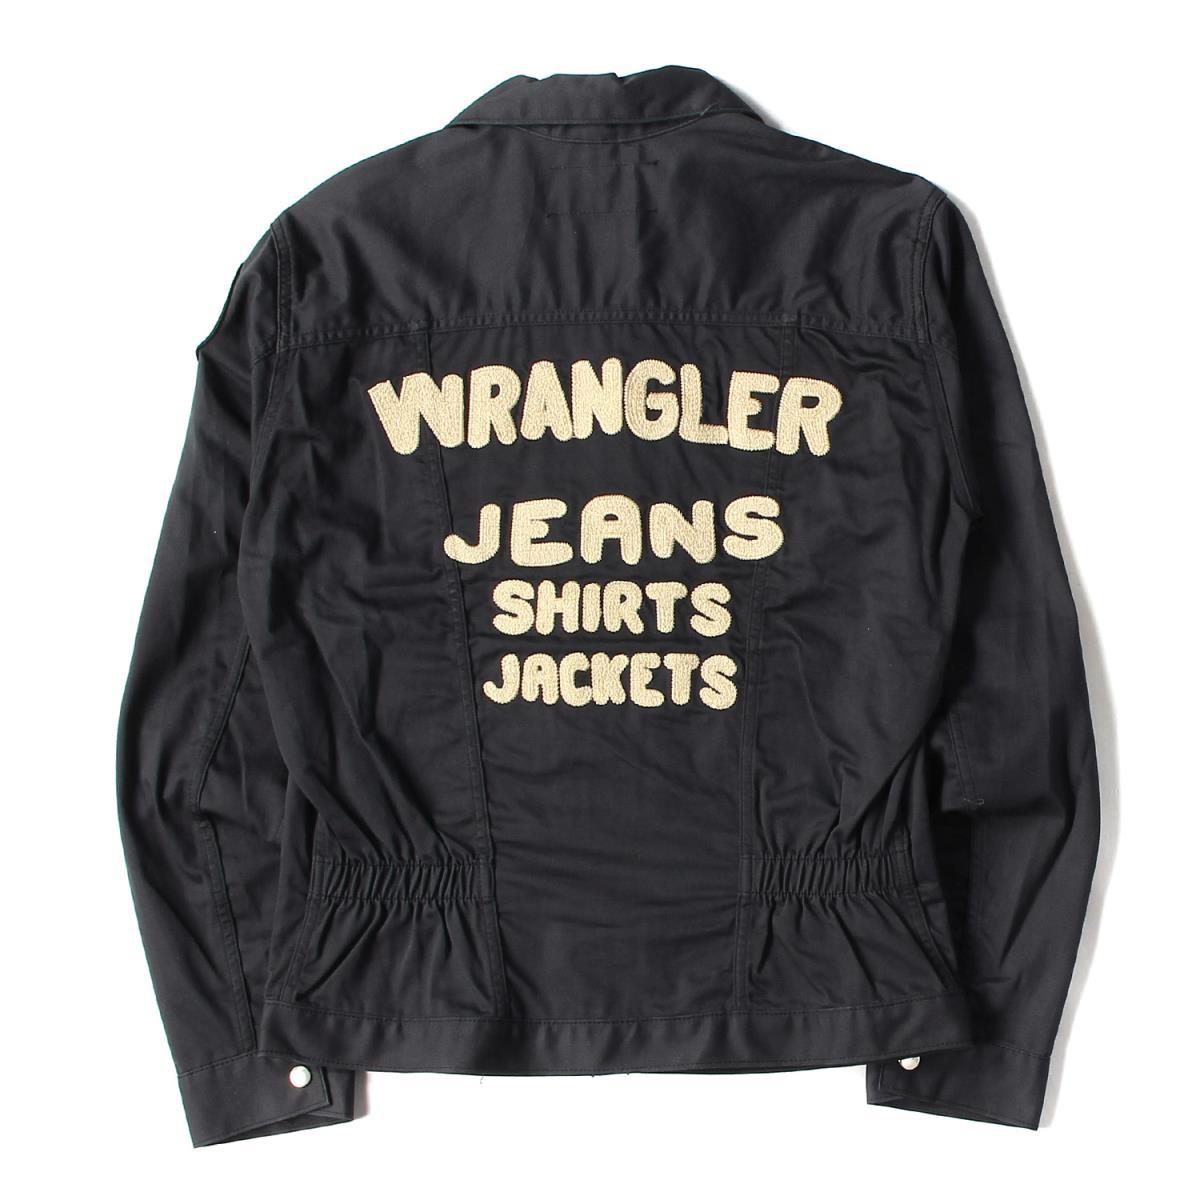 Wrangler ラングラー ジャケット 1950年代復刻 12MJZ チャンピオン ジャケット チャコール 40メンズUzGSMpVqL